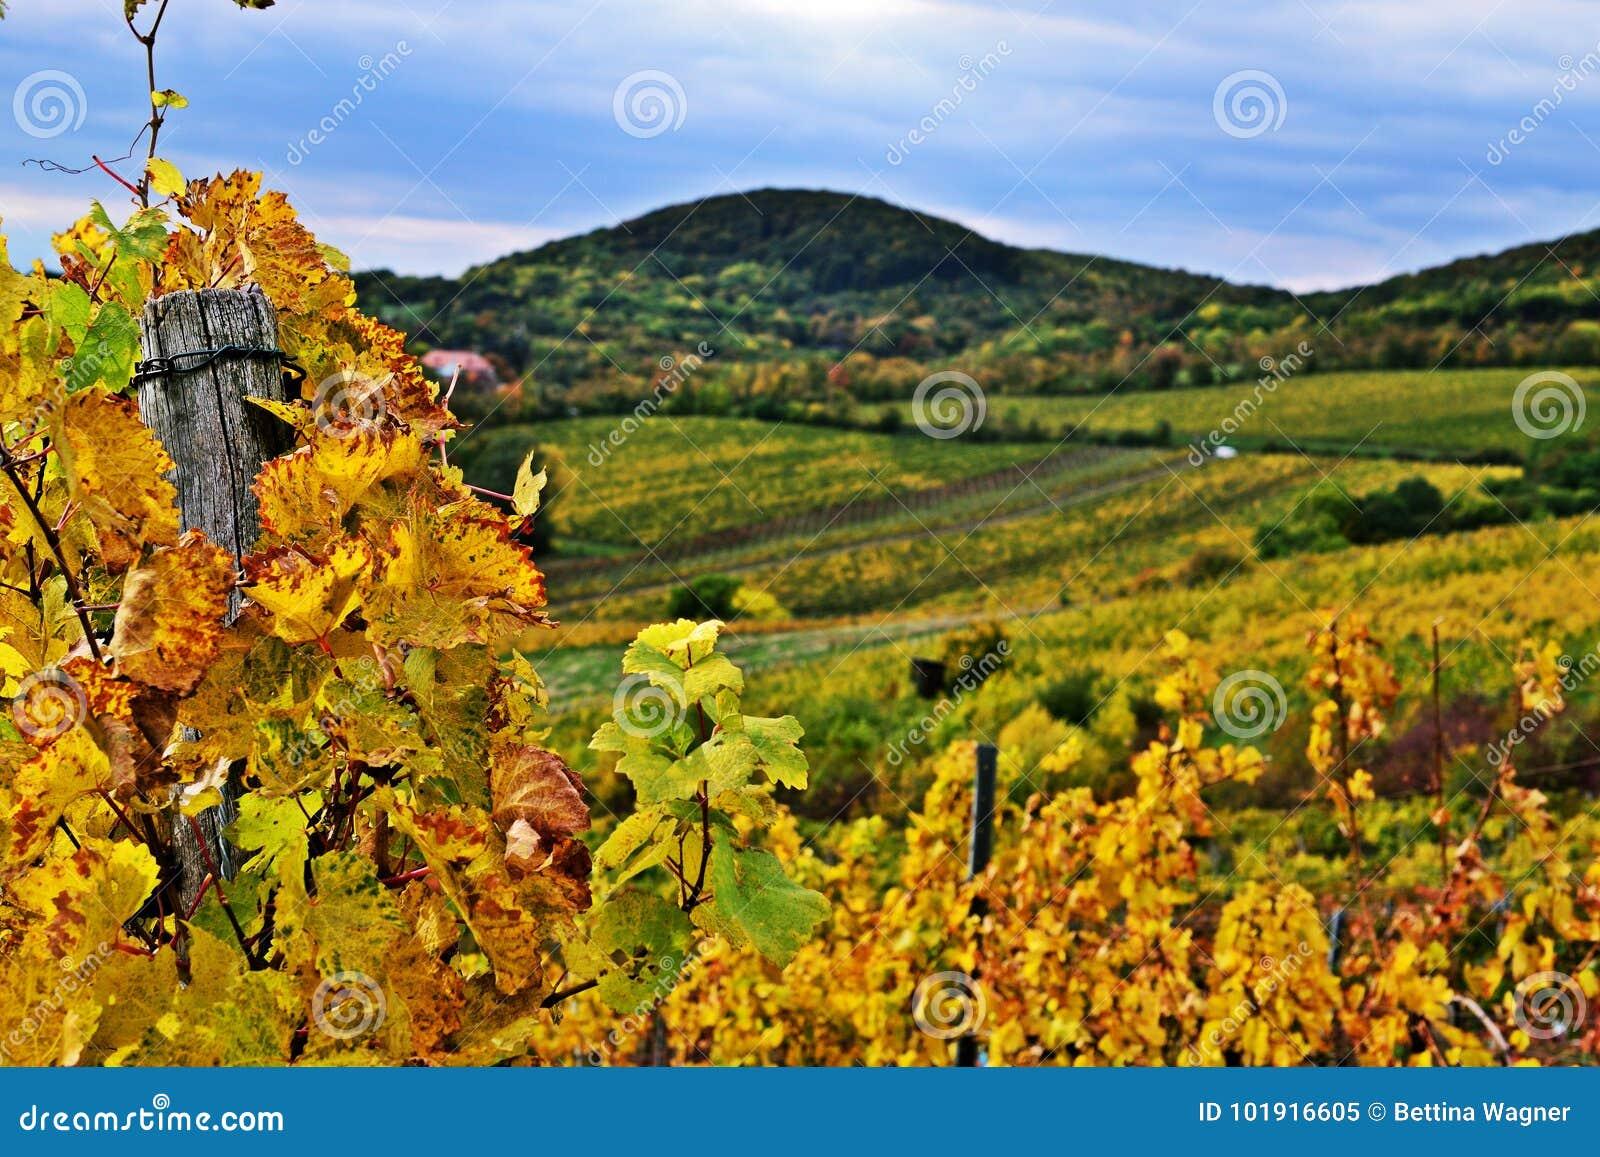 Vineyards Of Kahlenberg Wien Stock Image Image Of Clouds Hills